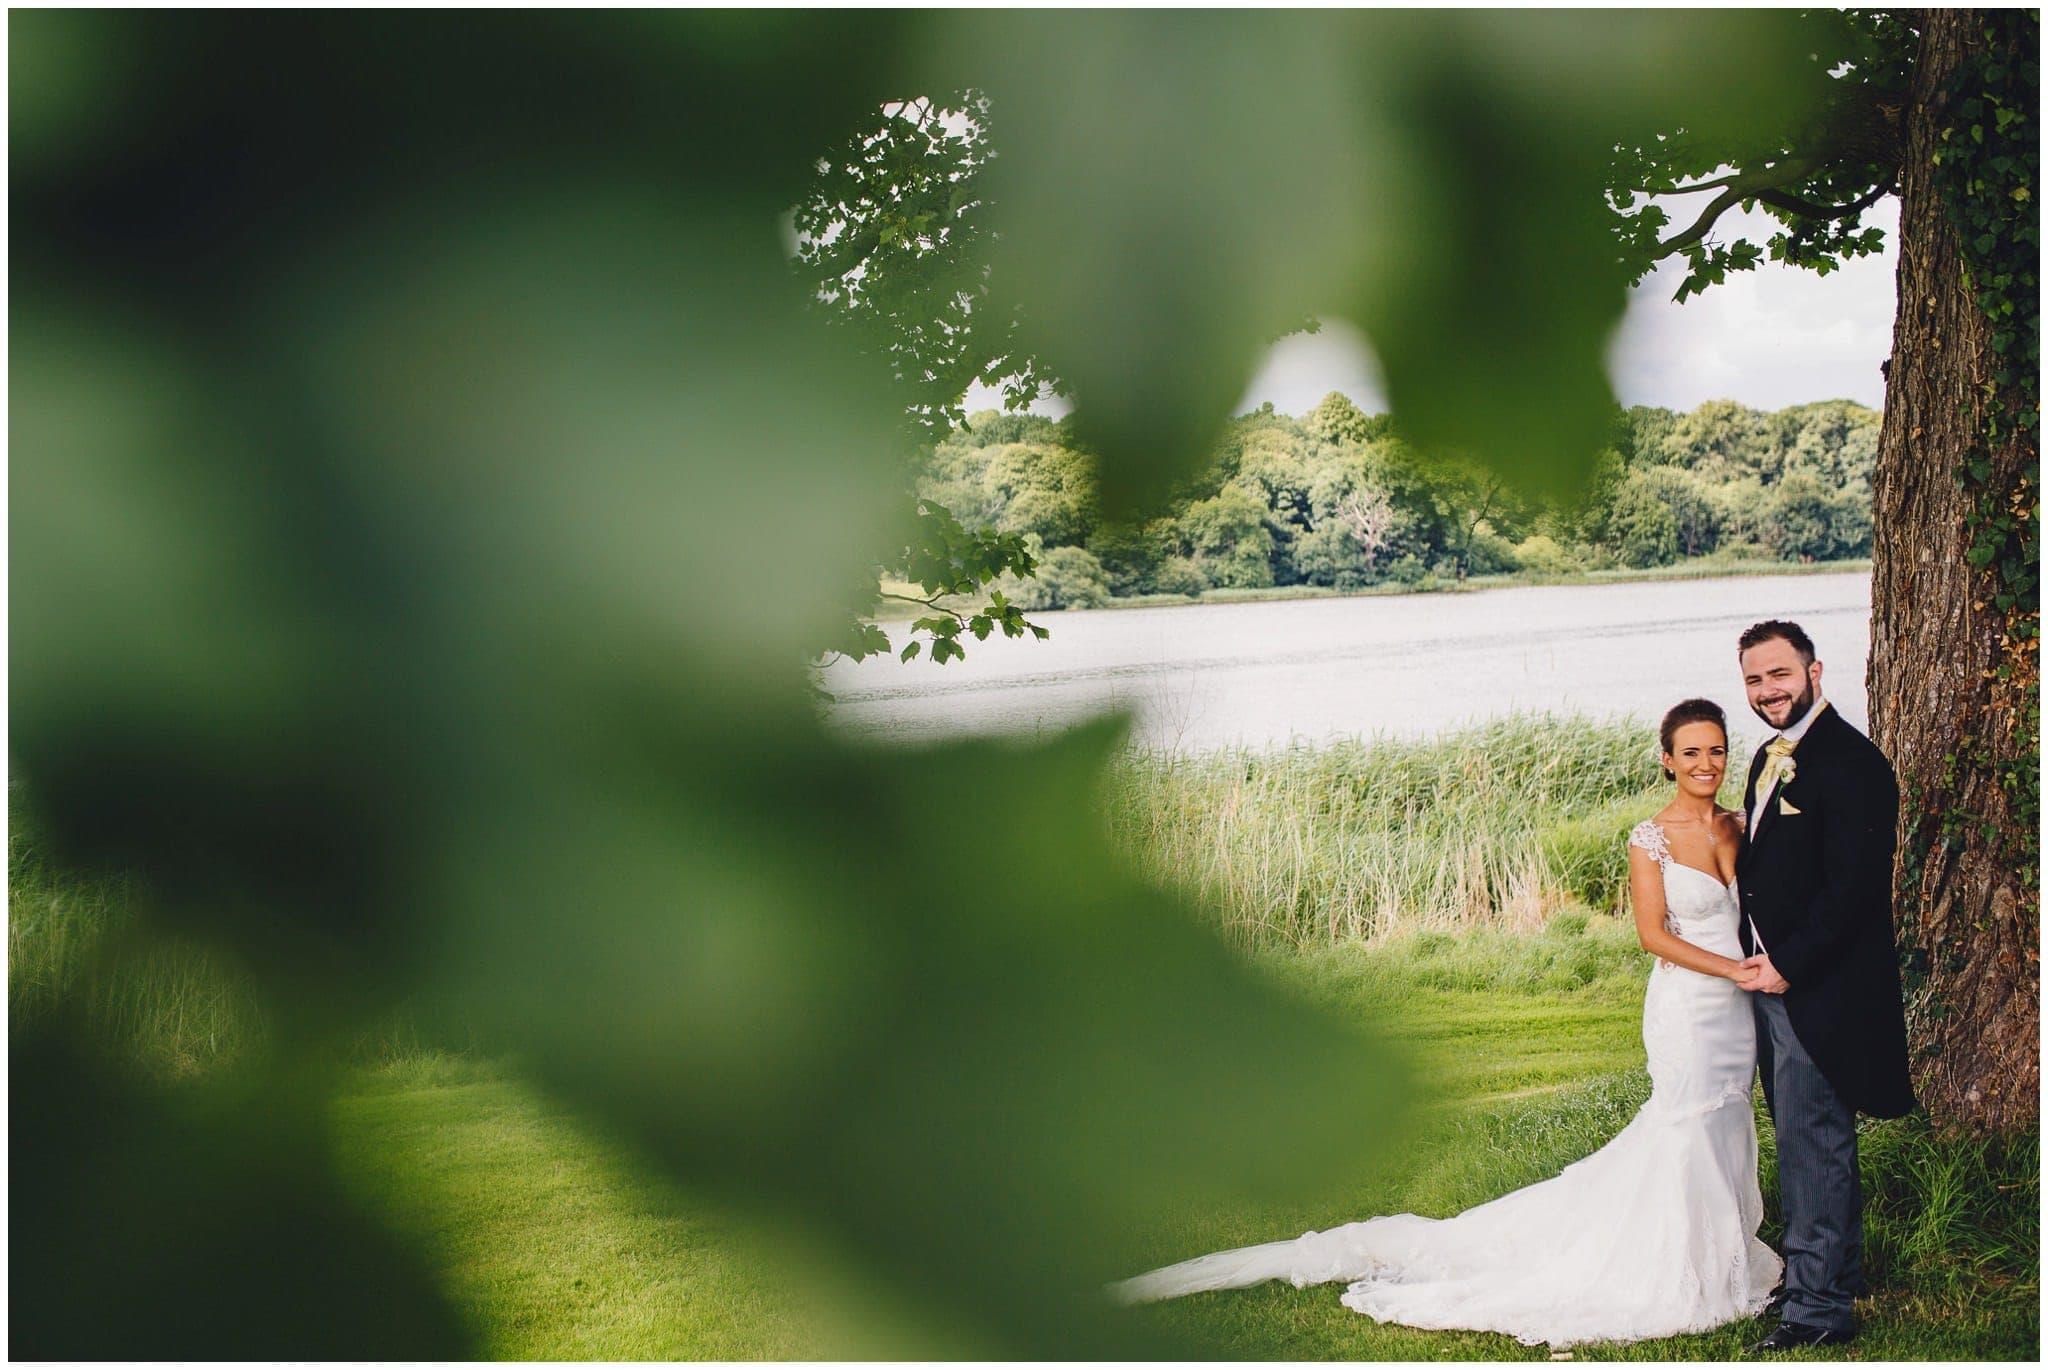 combermere-abbey-wedding-photographer-65